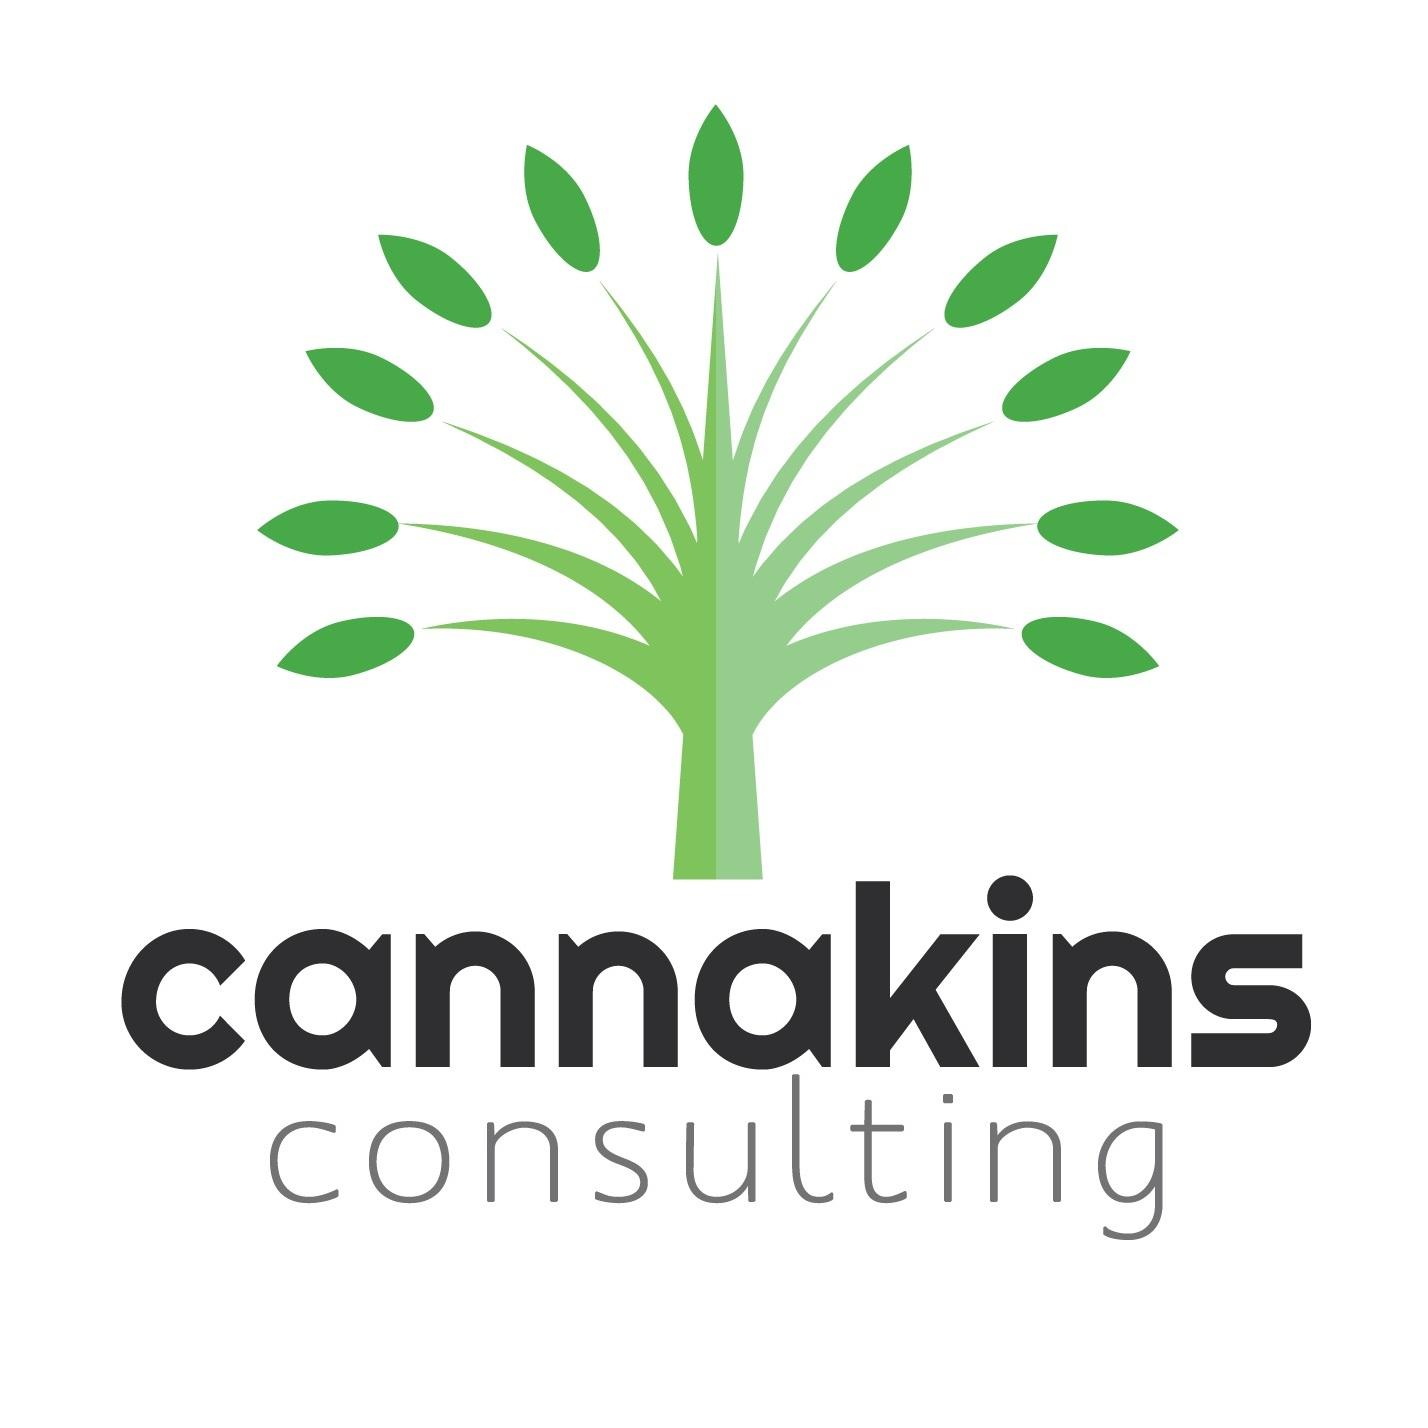 Cannakins_Logo_v1_LinkedInCEOPhoto-01.jpg